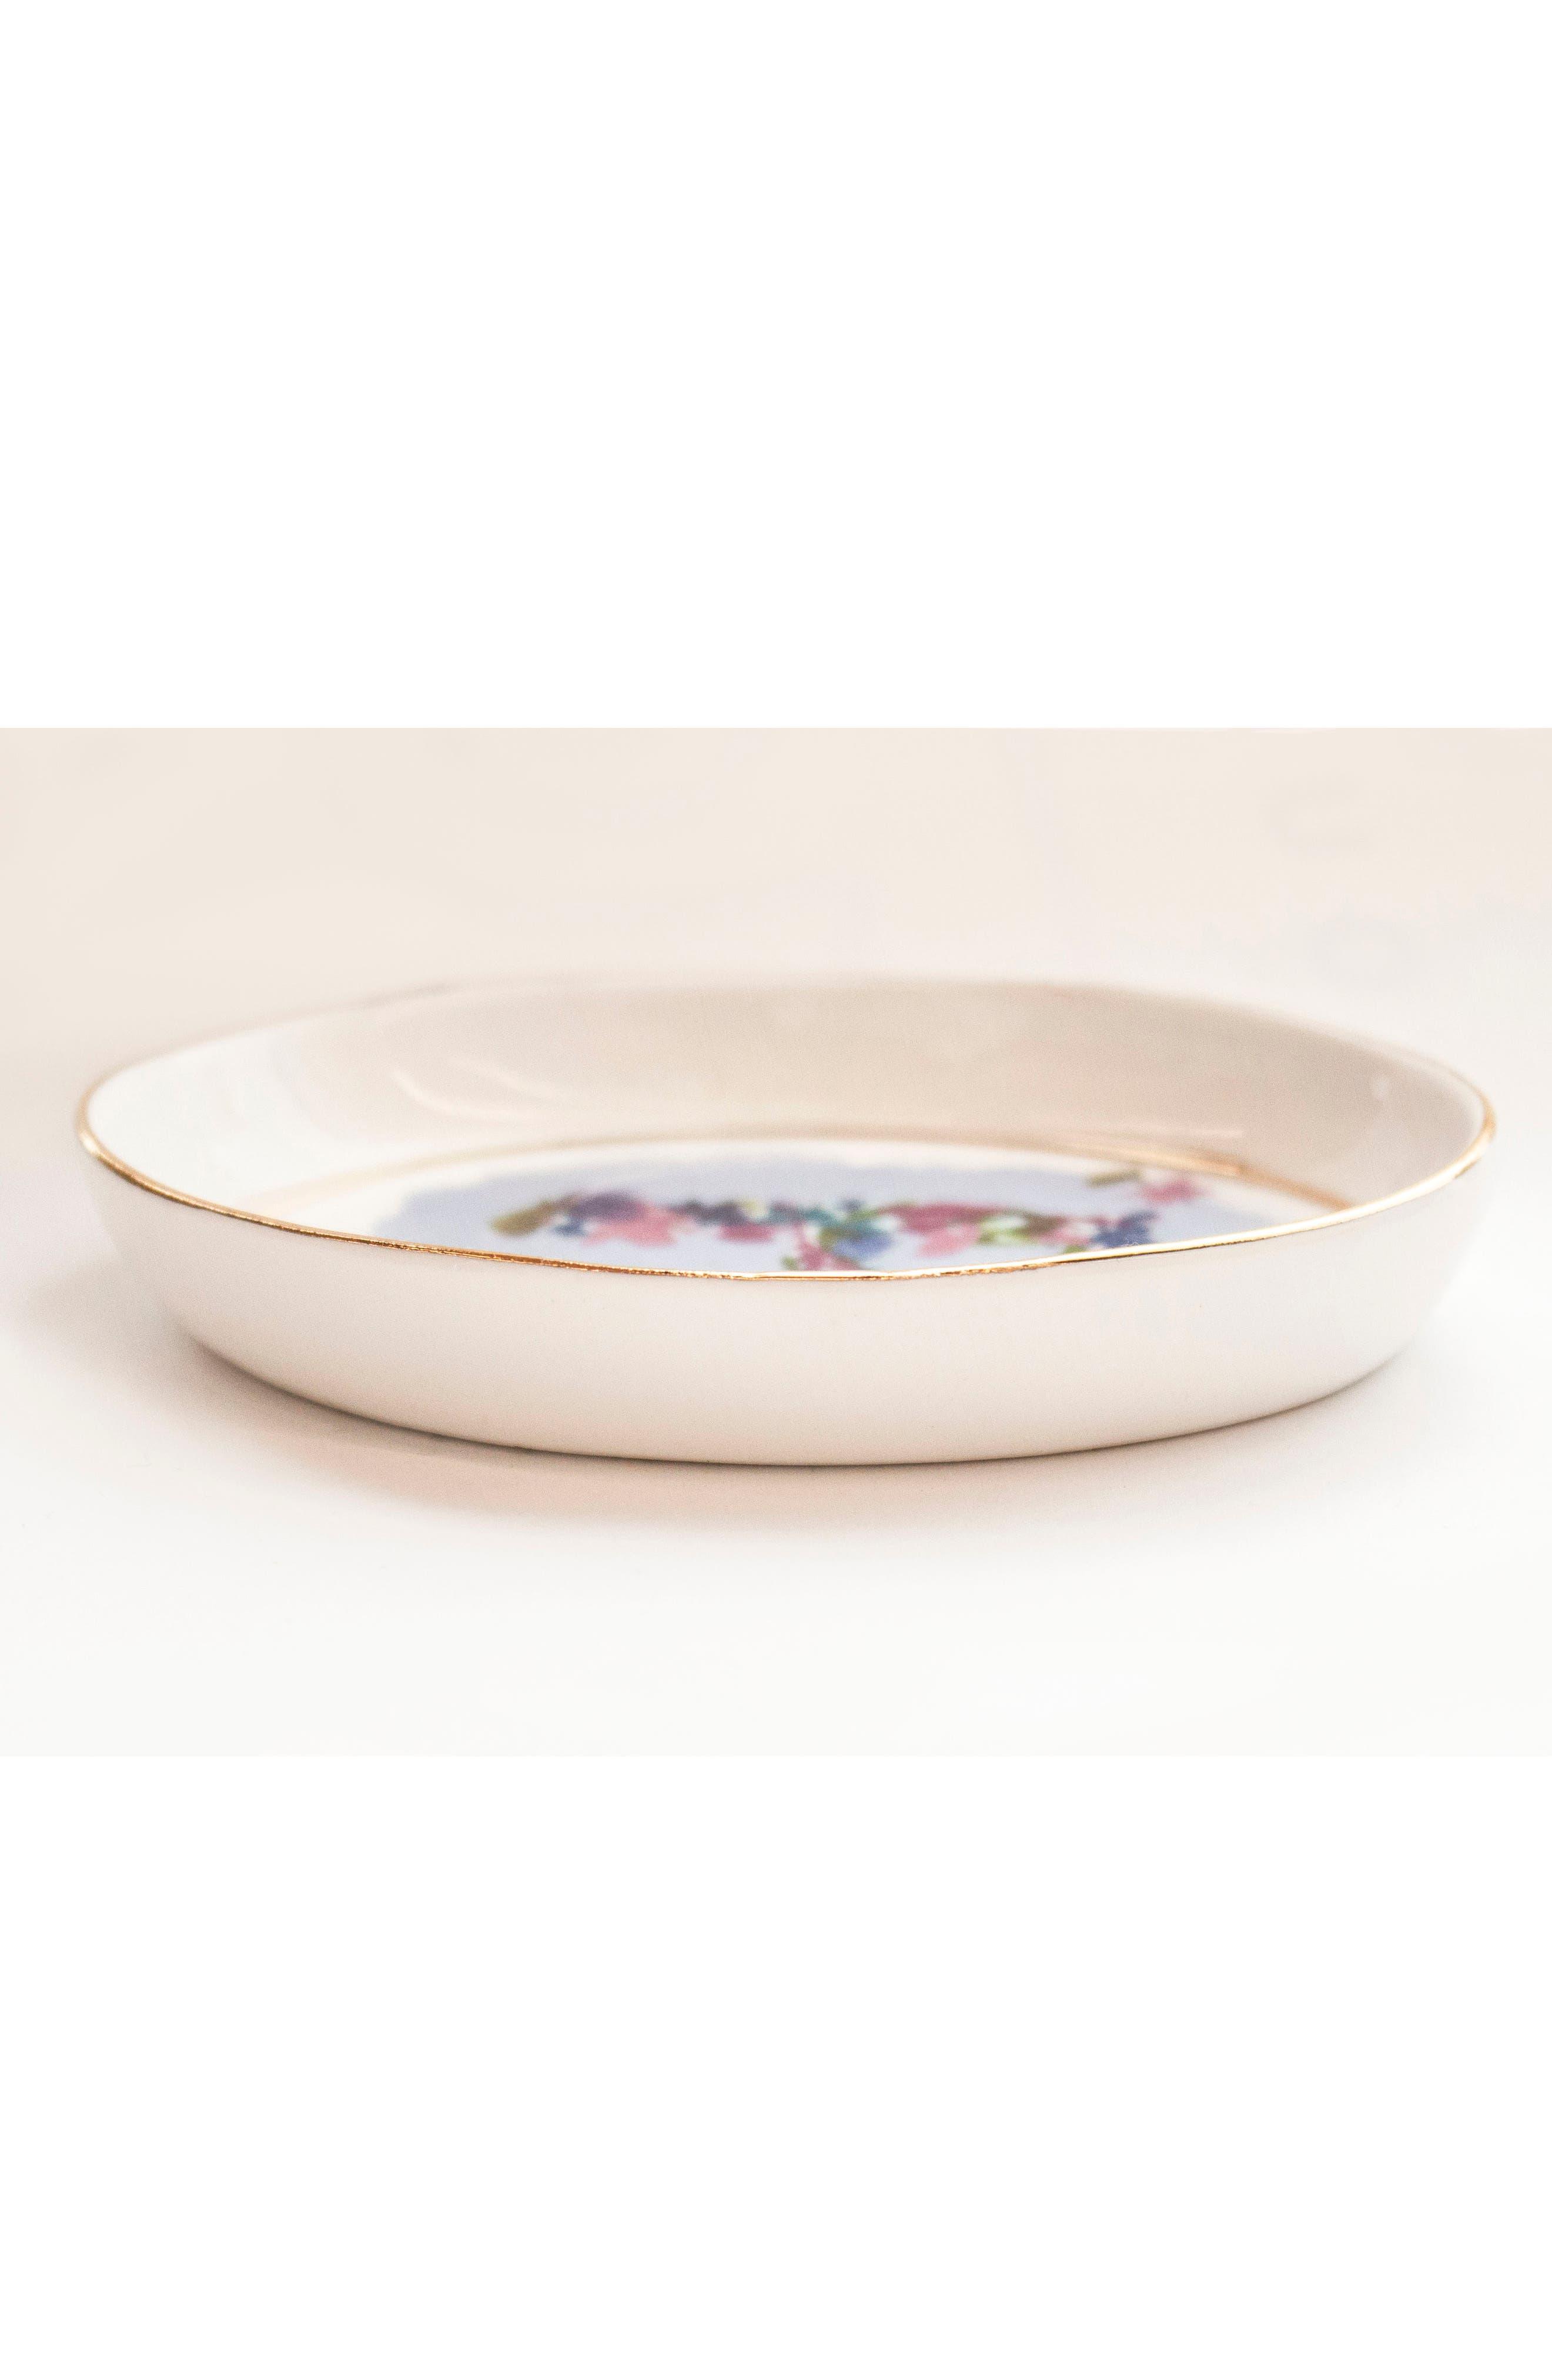 ANTHROPOLOGIE,                             Kiana Mosley Monogram Trinket Dish,                             Alternate thumbnail 3, color,                             100